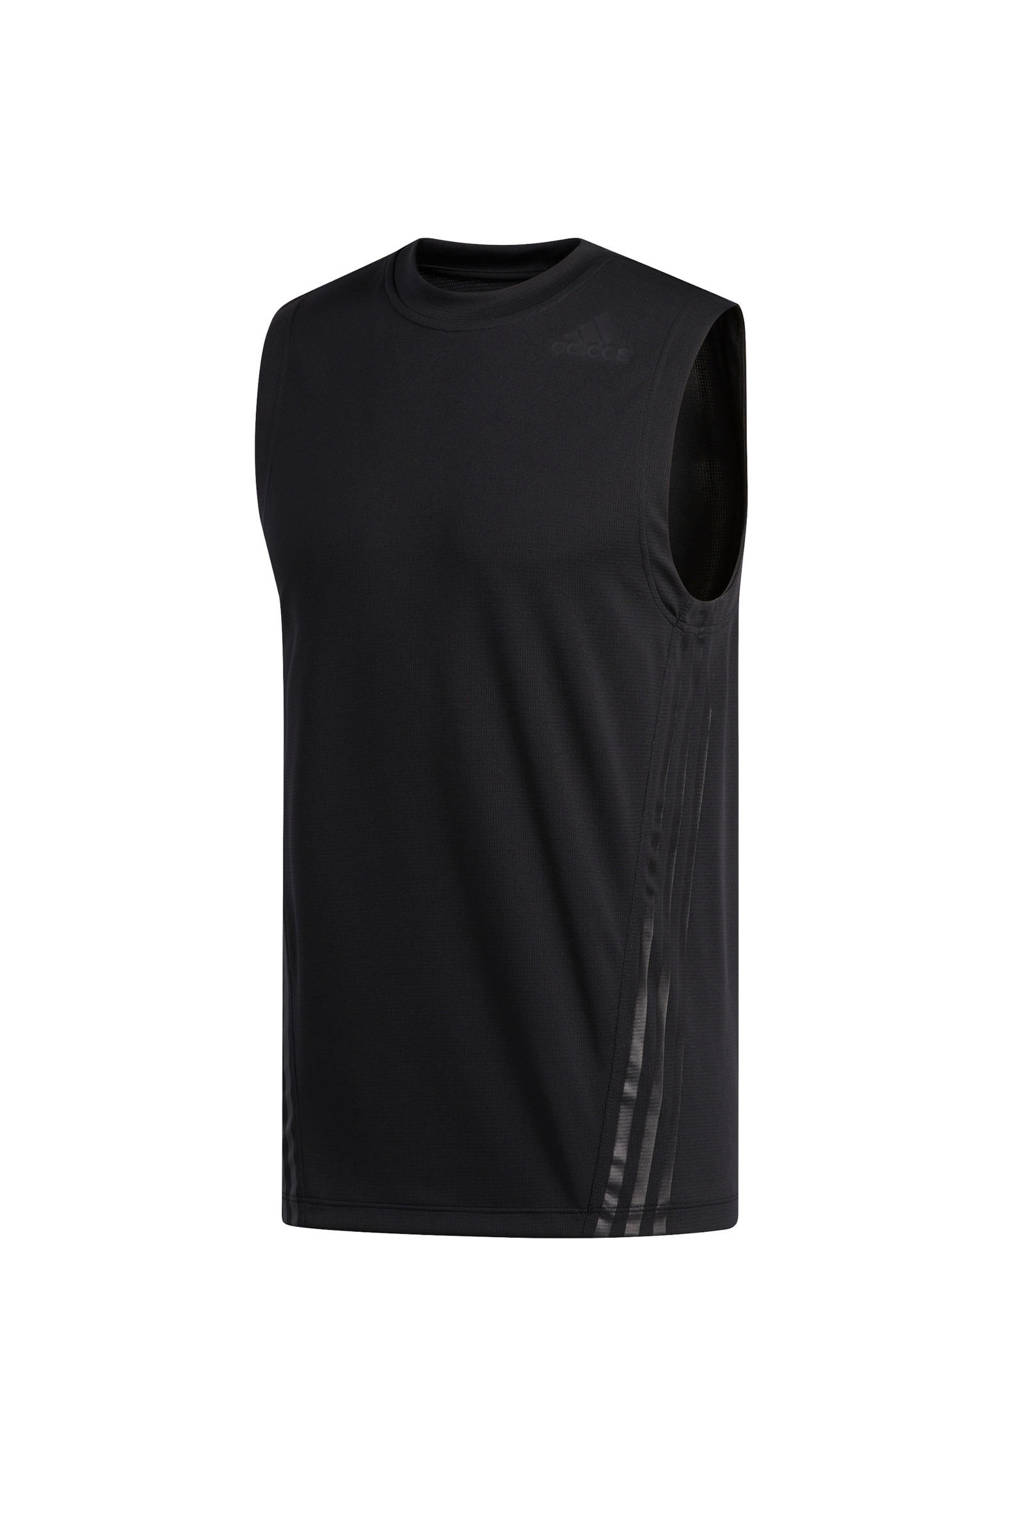 adidas Performance   sportsinglet zwart, Zwart